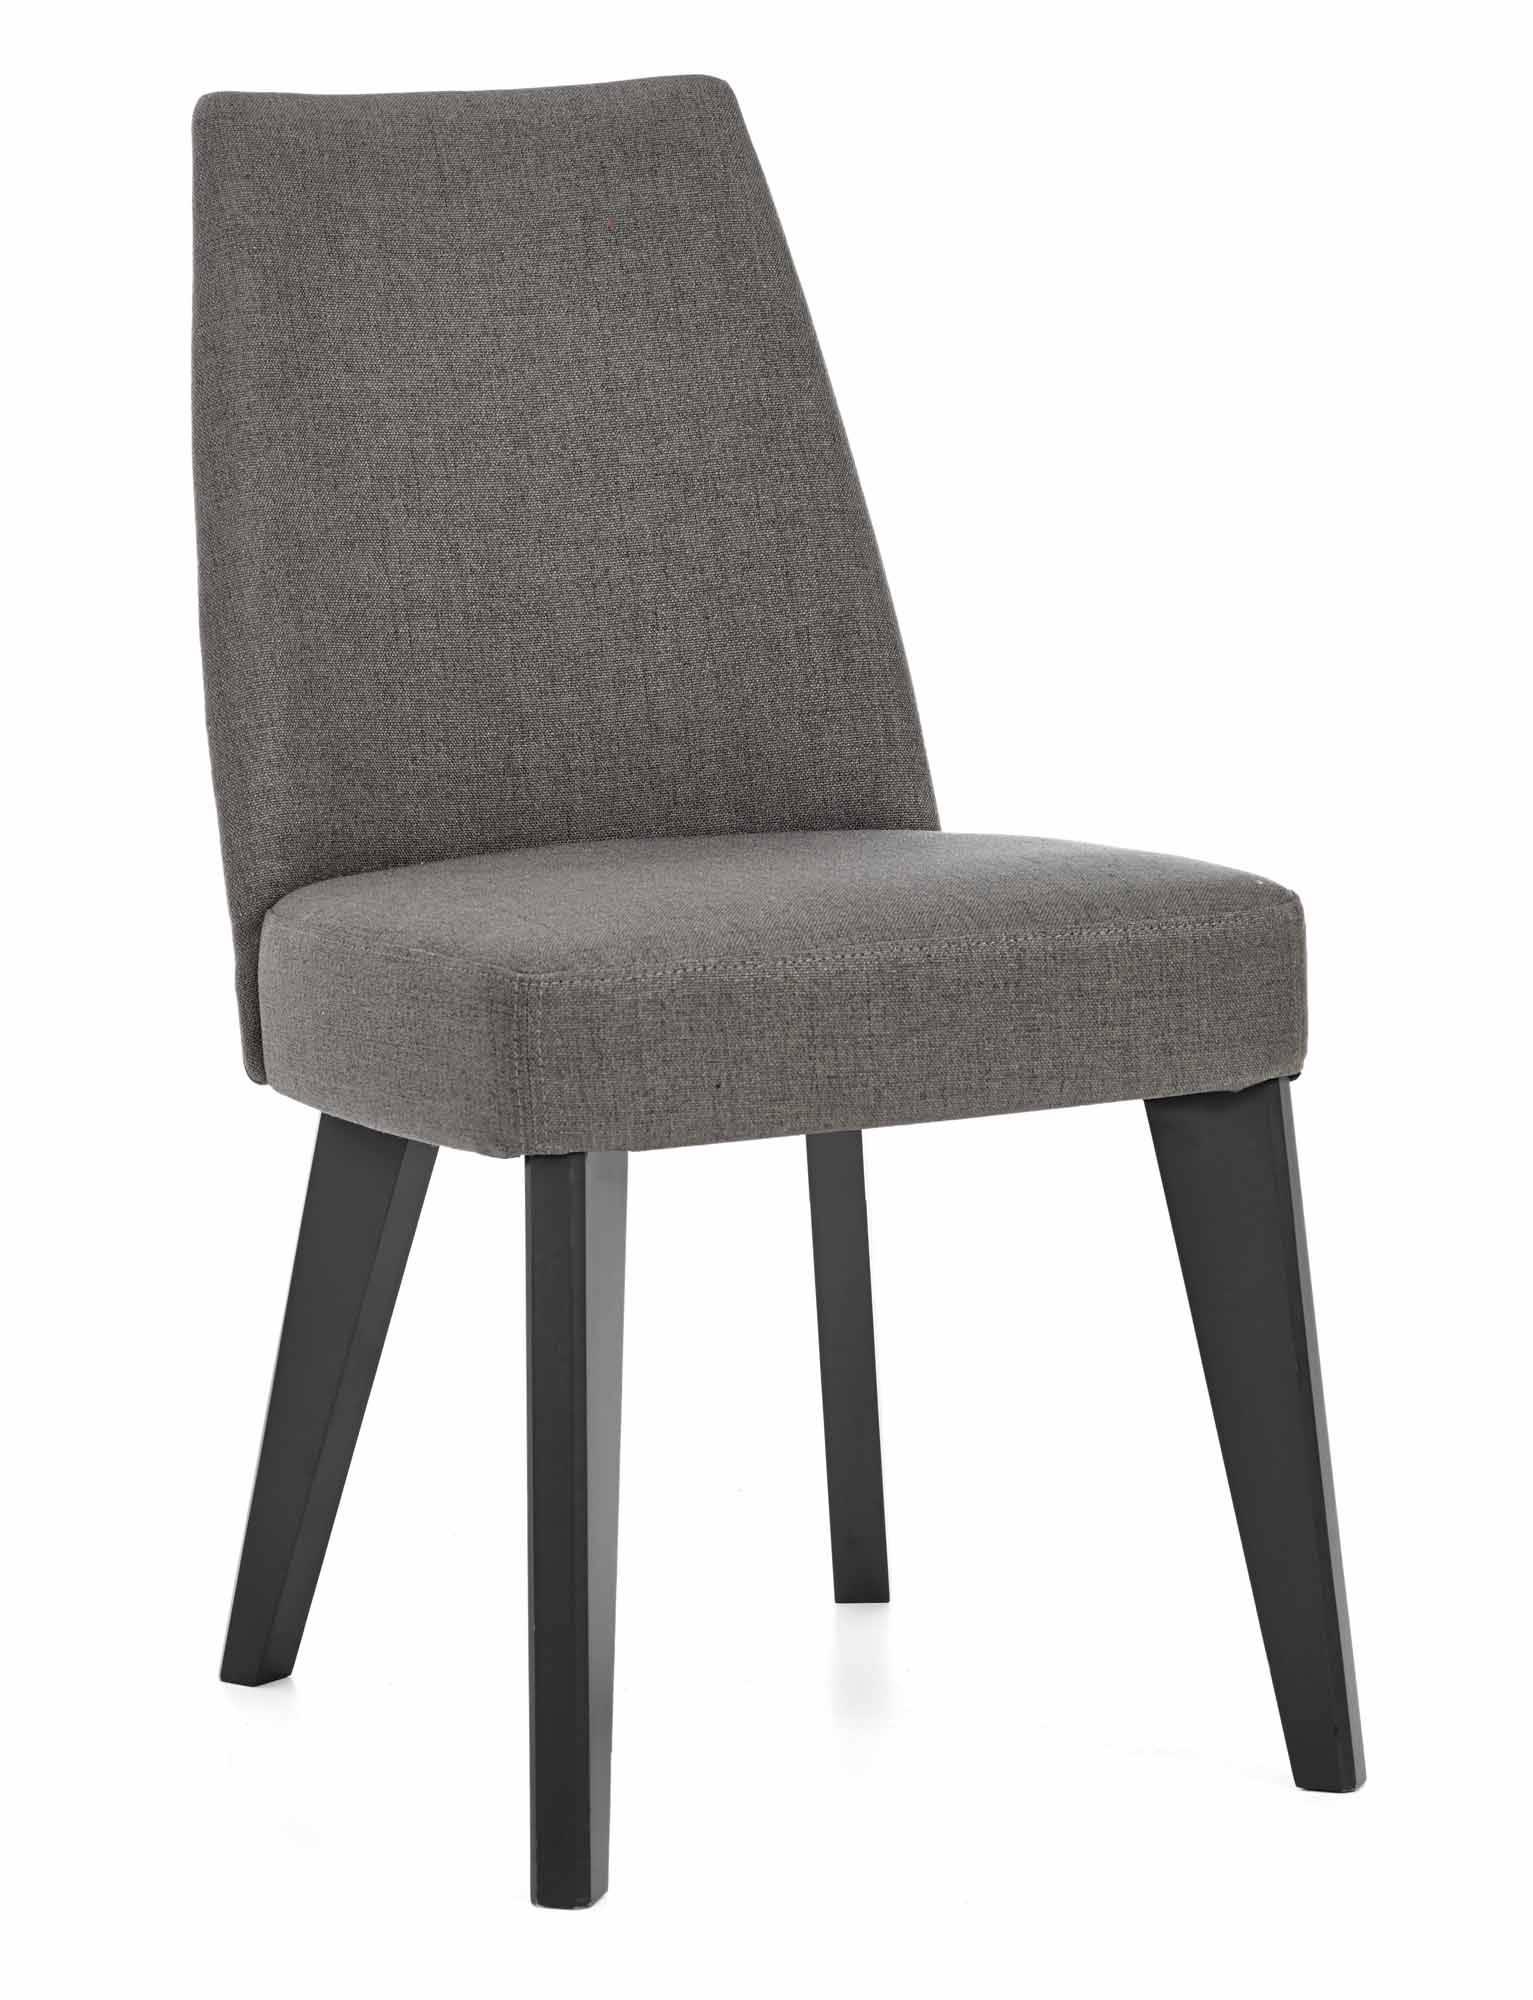 Fine Quebec Upholstered Fixed Swivel Dining Chair Pair Ncnpc Chair Design For Home Ncnpcorg